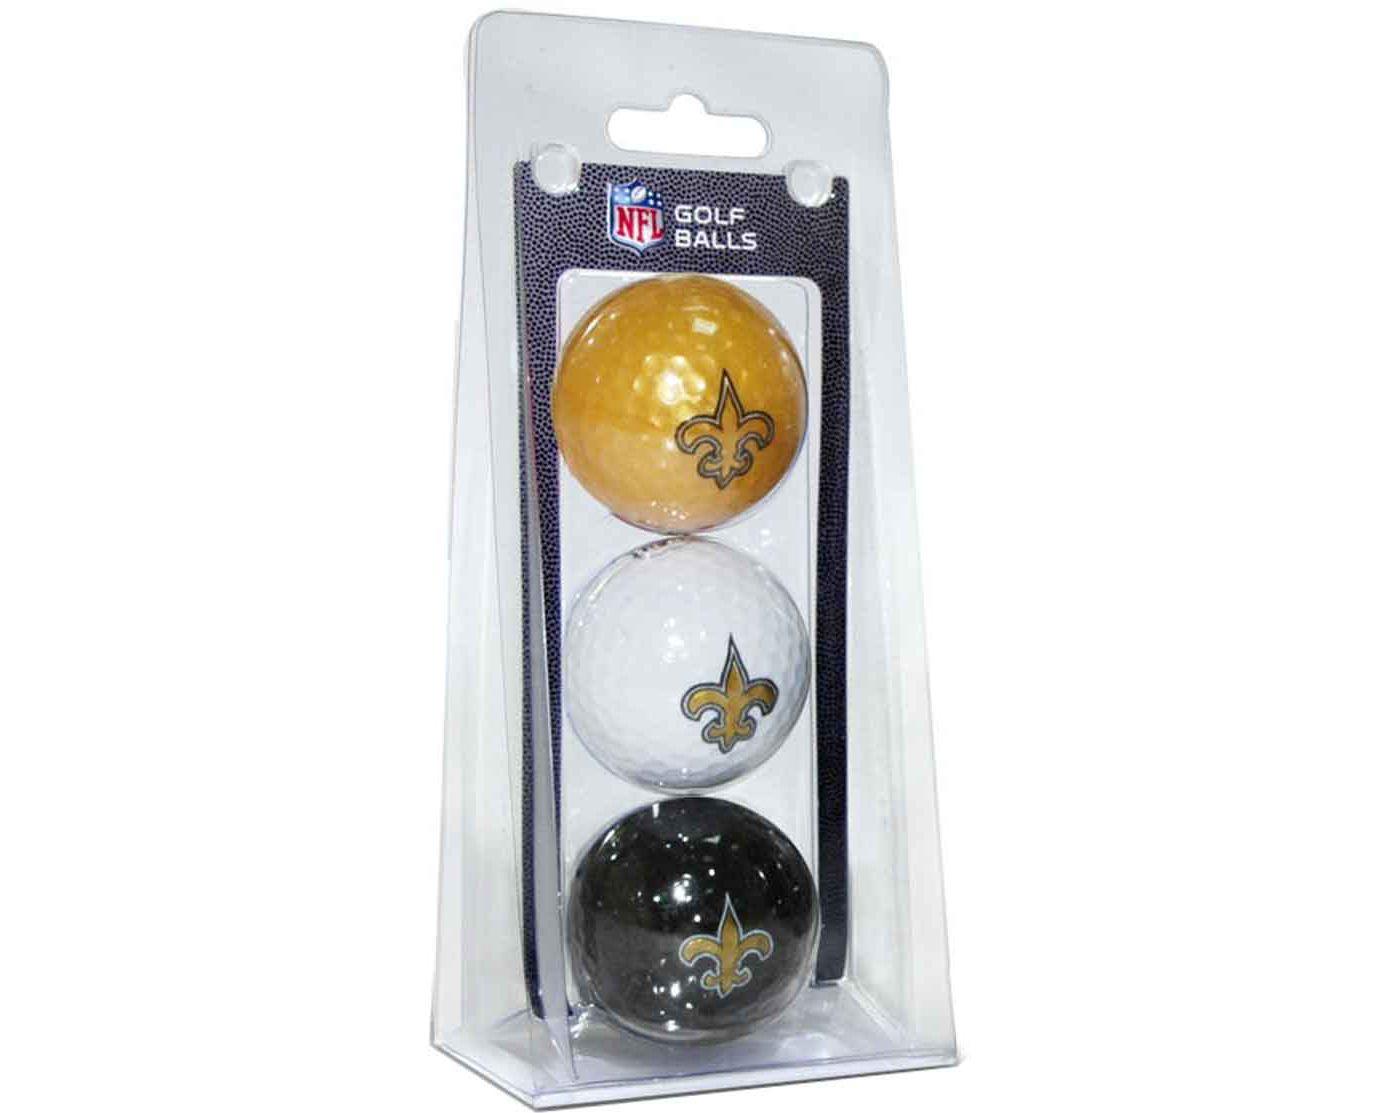 Team Golf New Orleans Saints Golf Balls – 3 Pack